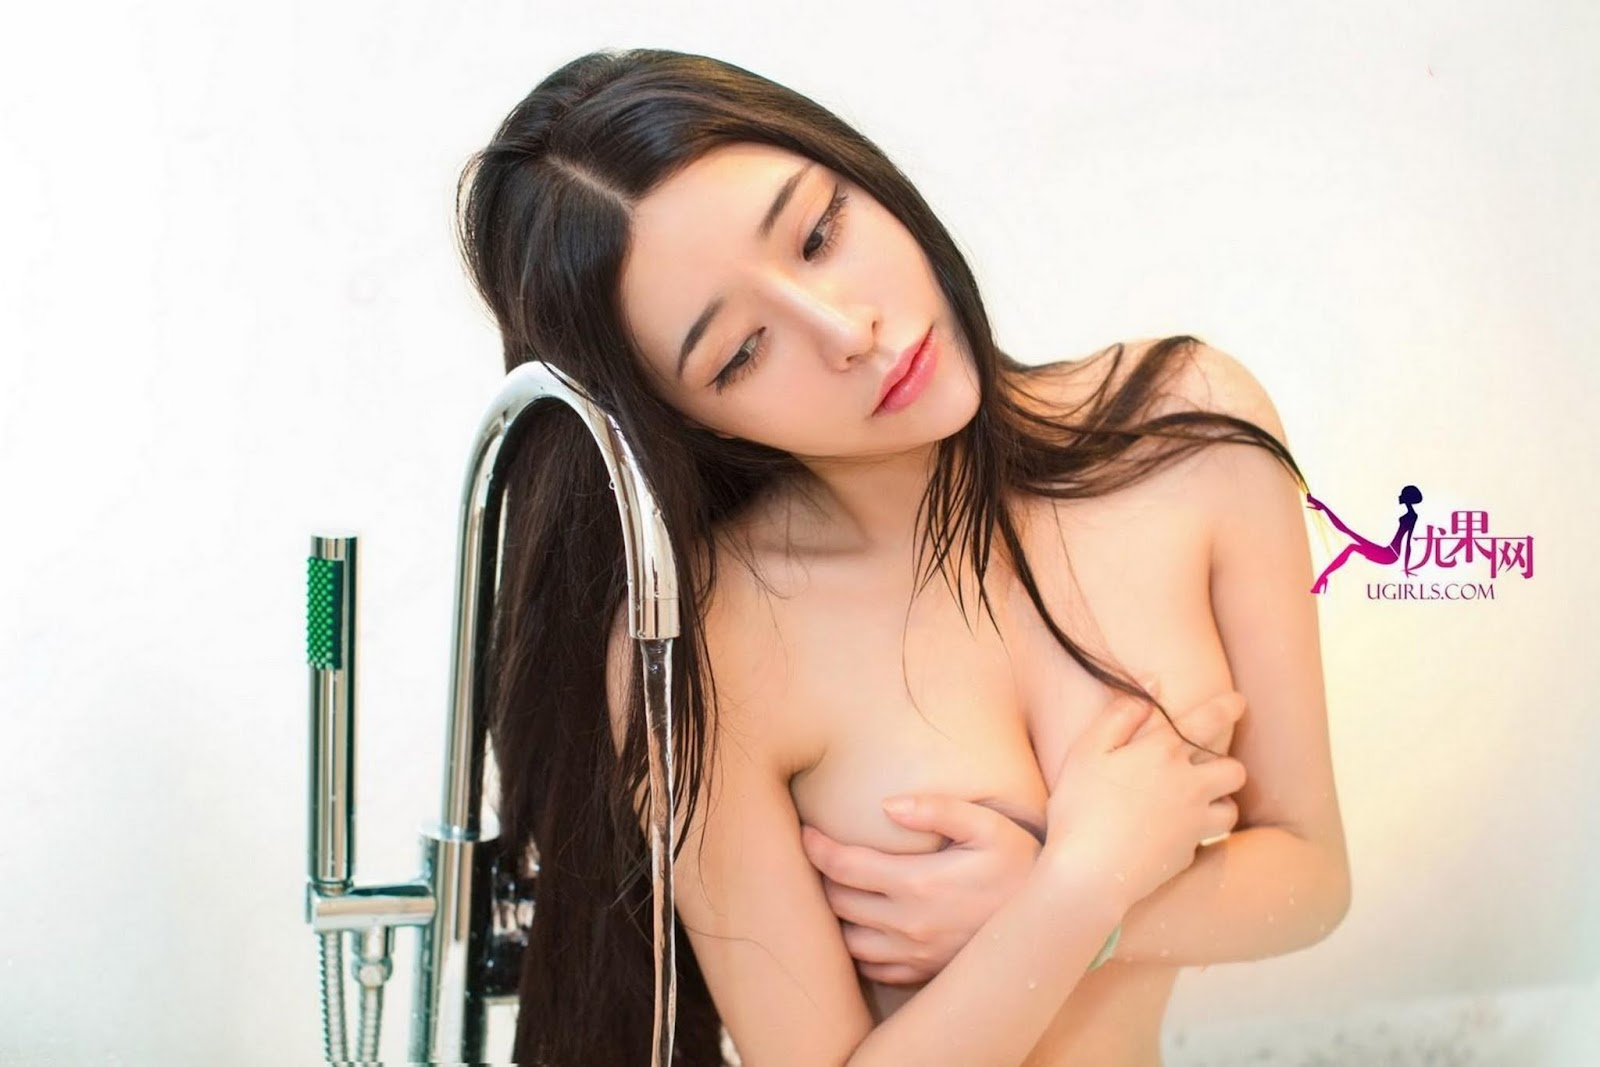 61 - Sexy Photo UGIRLS NO.103 Nude Girl